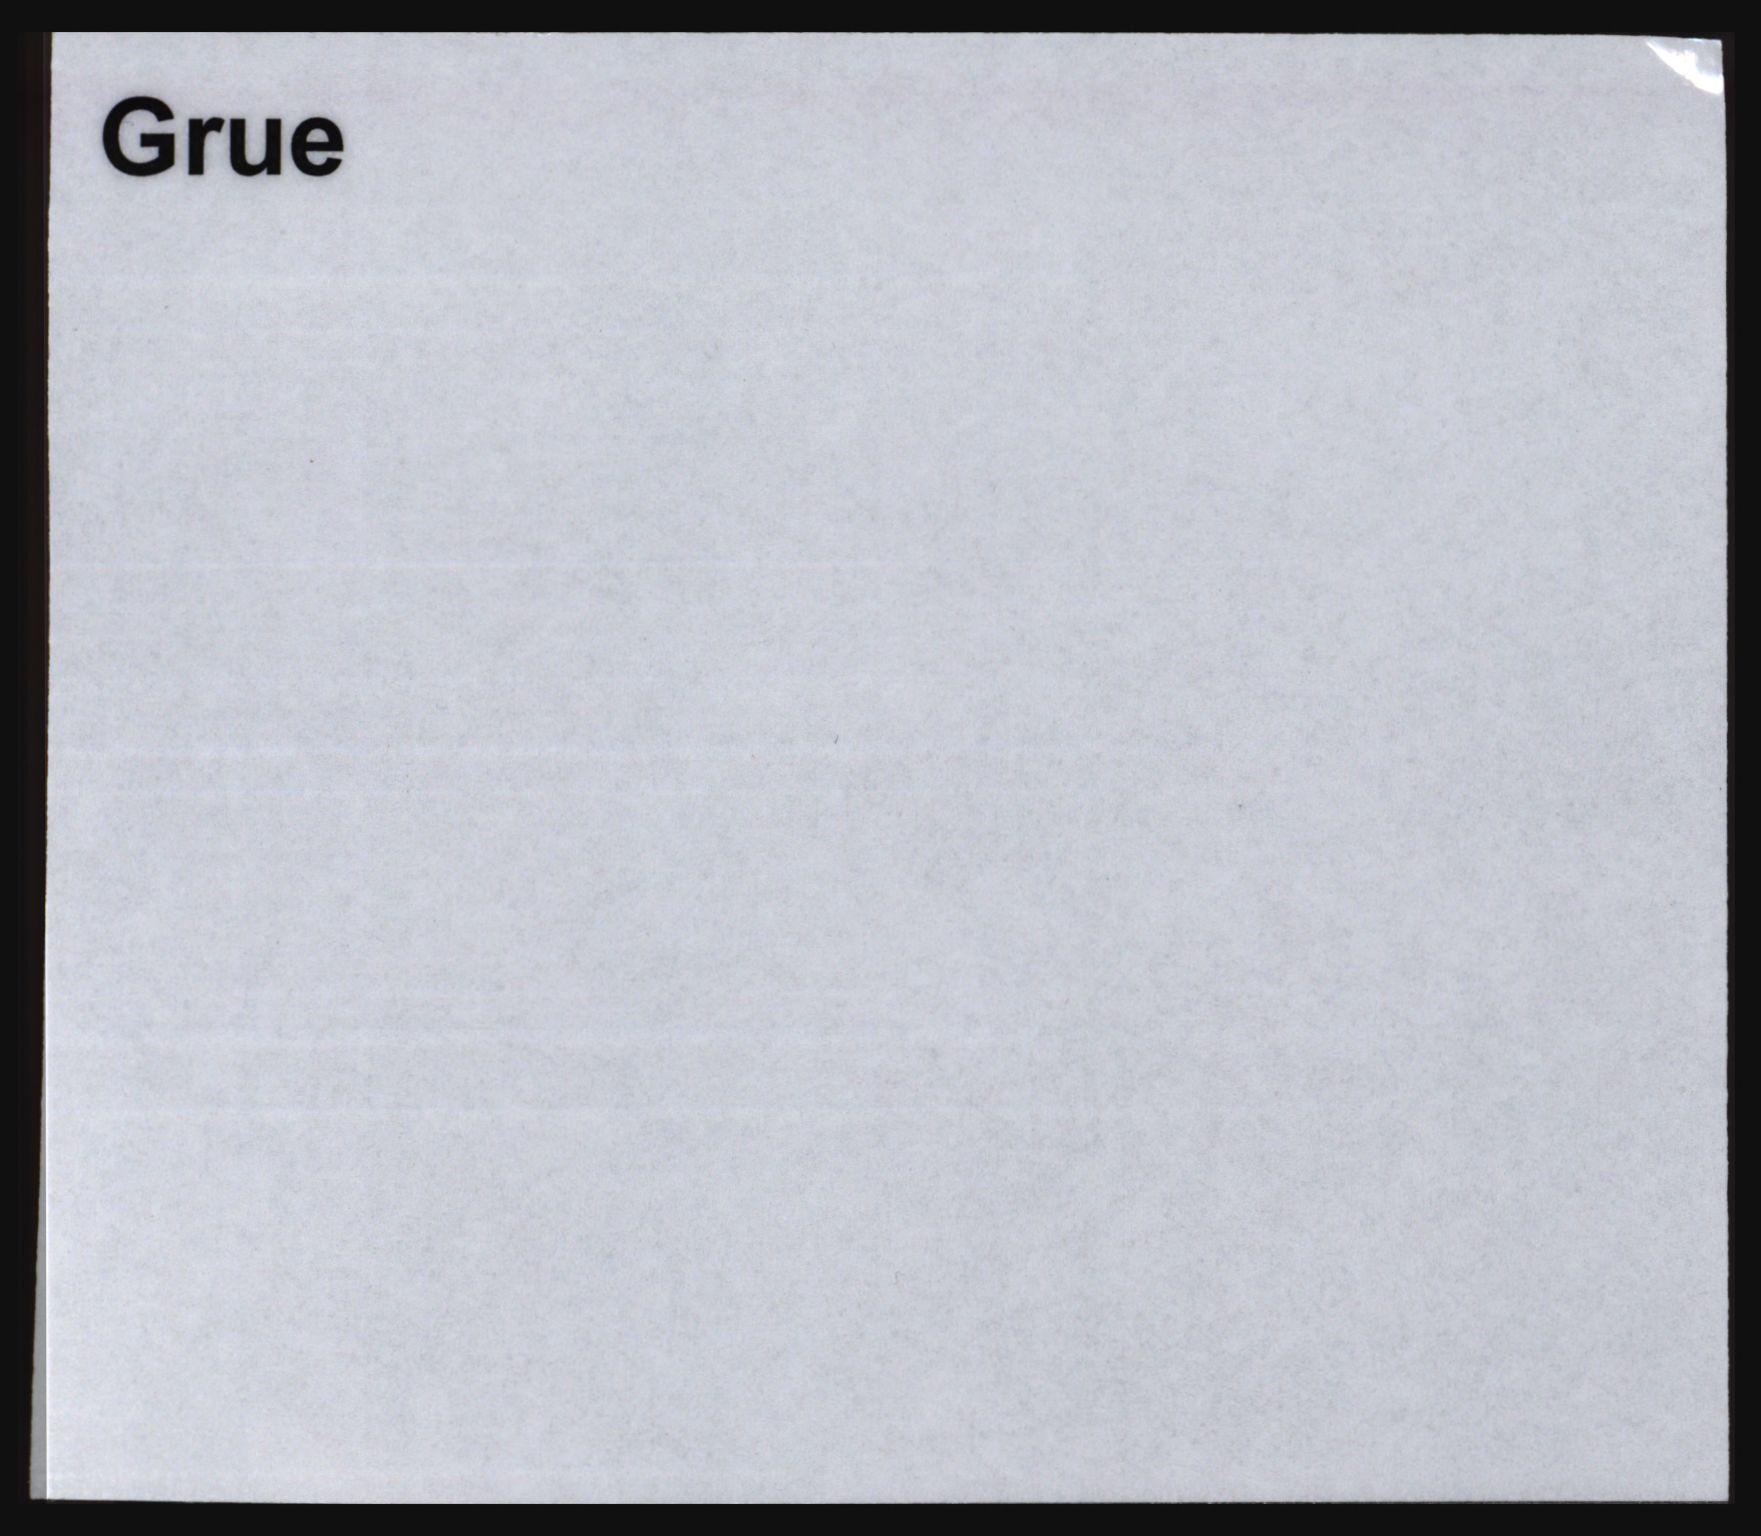 SAH, Norges Brannkasse, Grue, s. 1